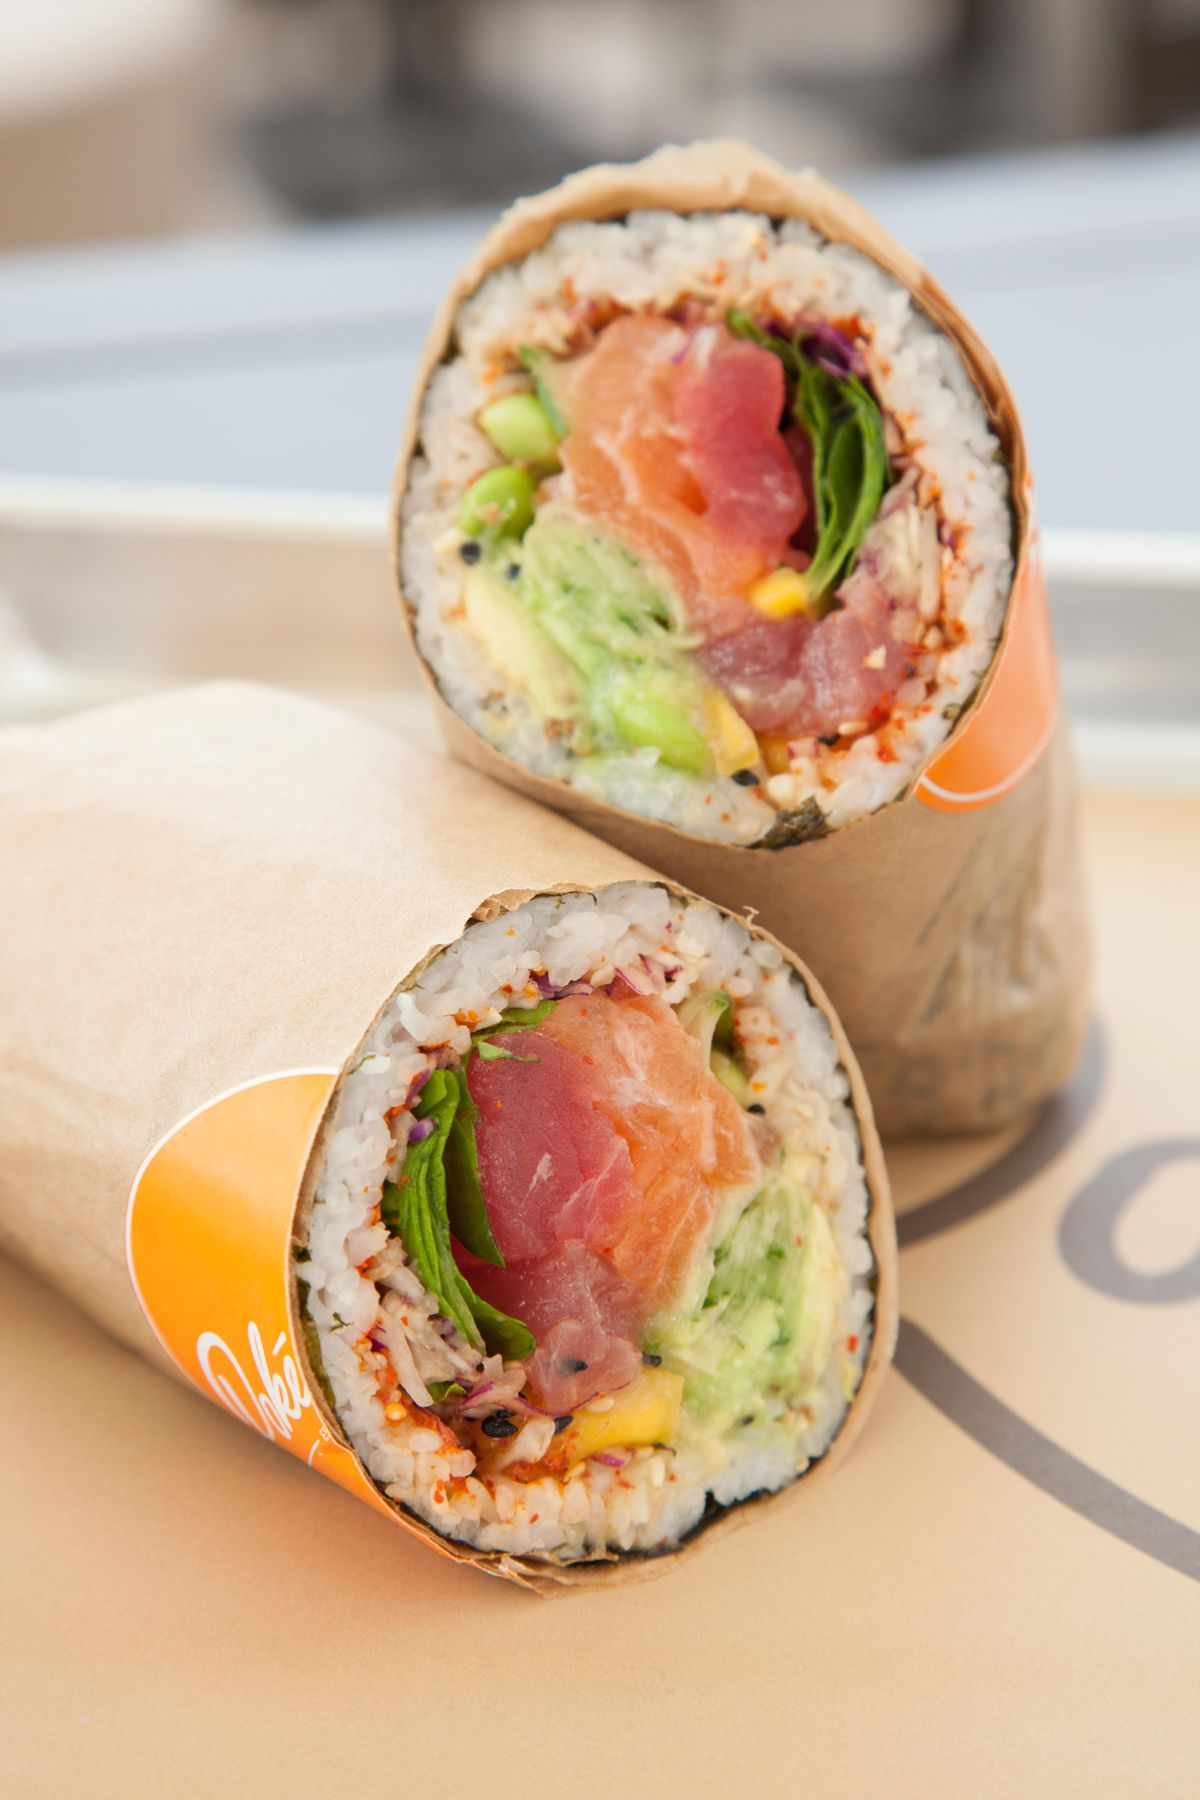 Pokéworks sushi burrito